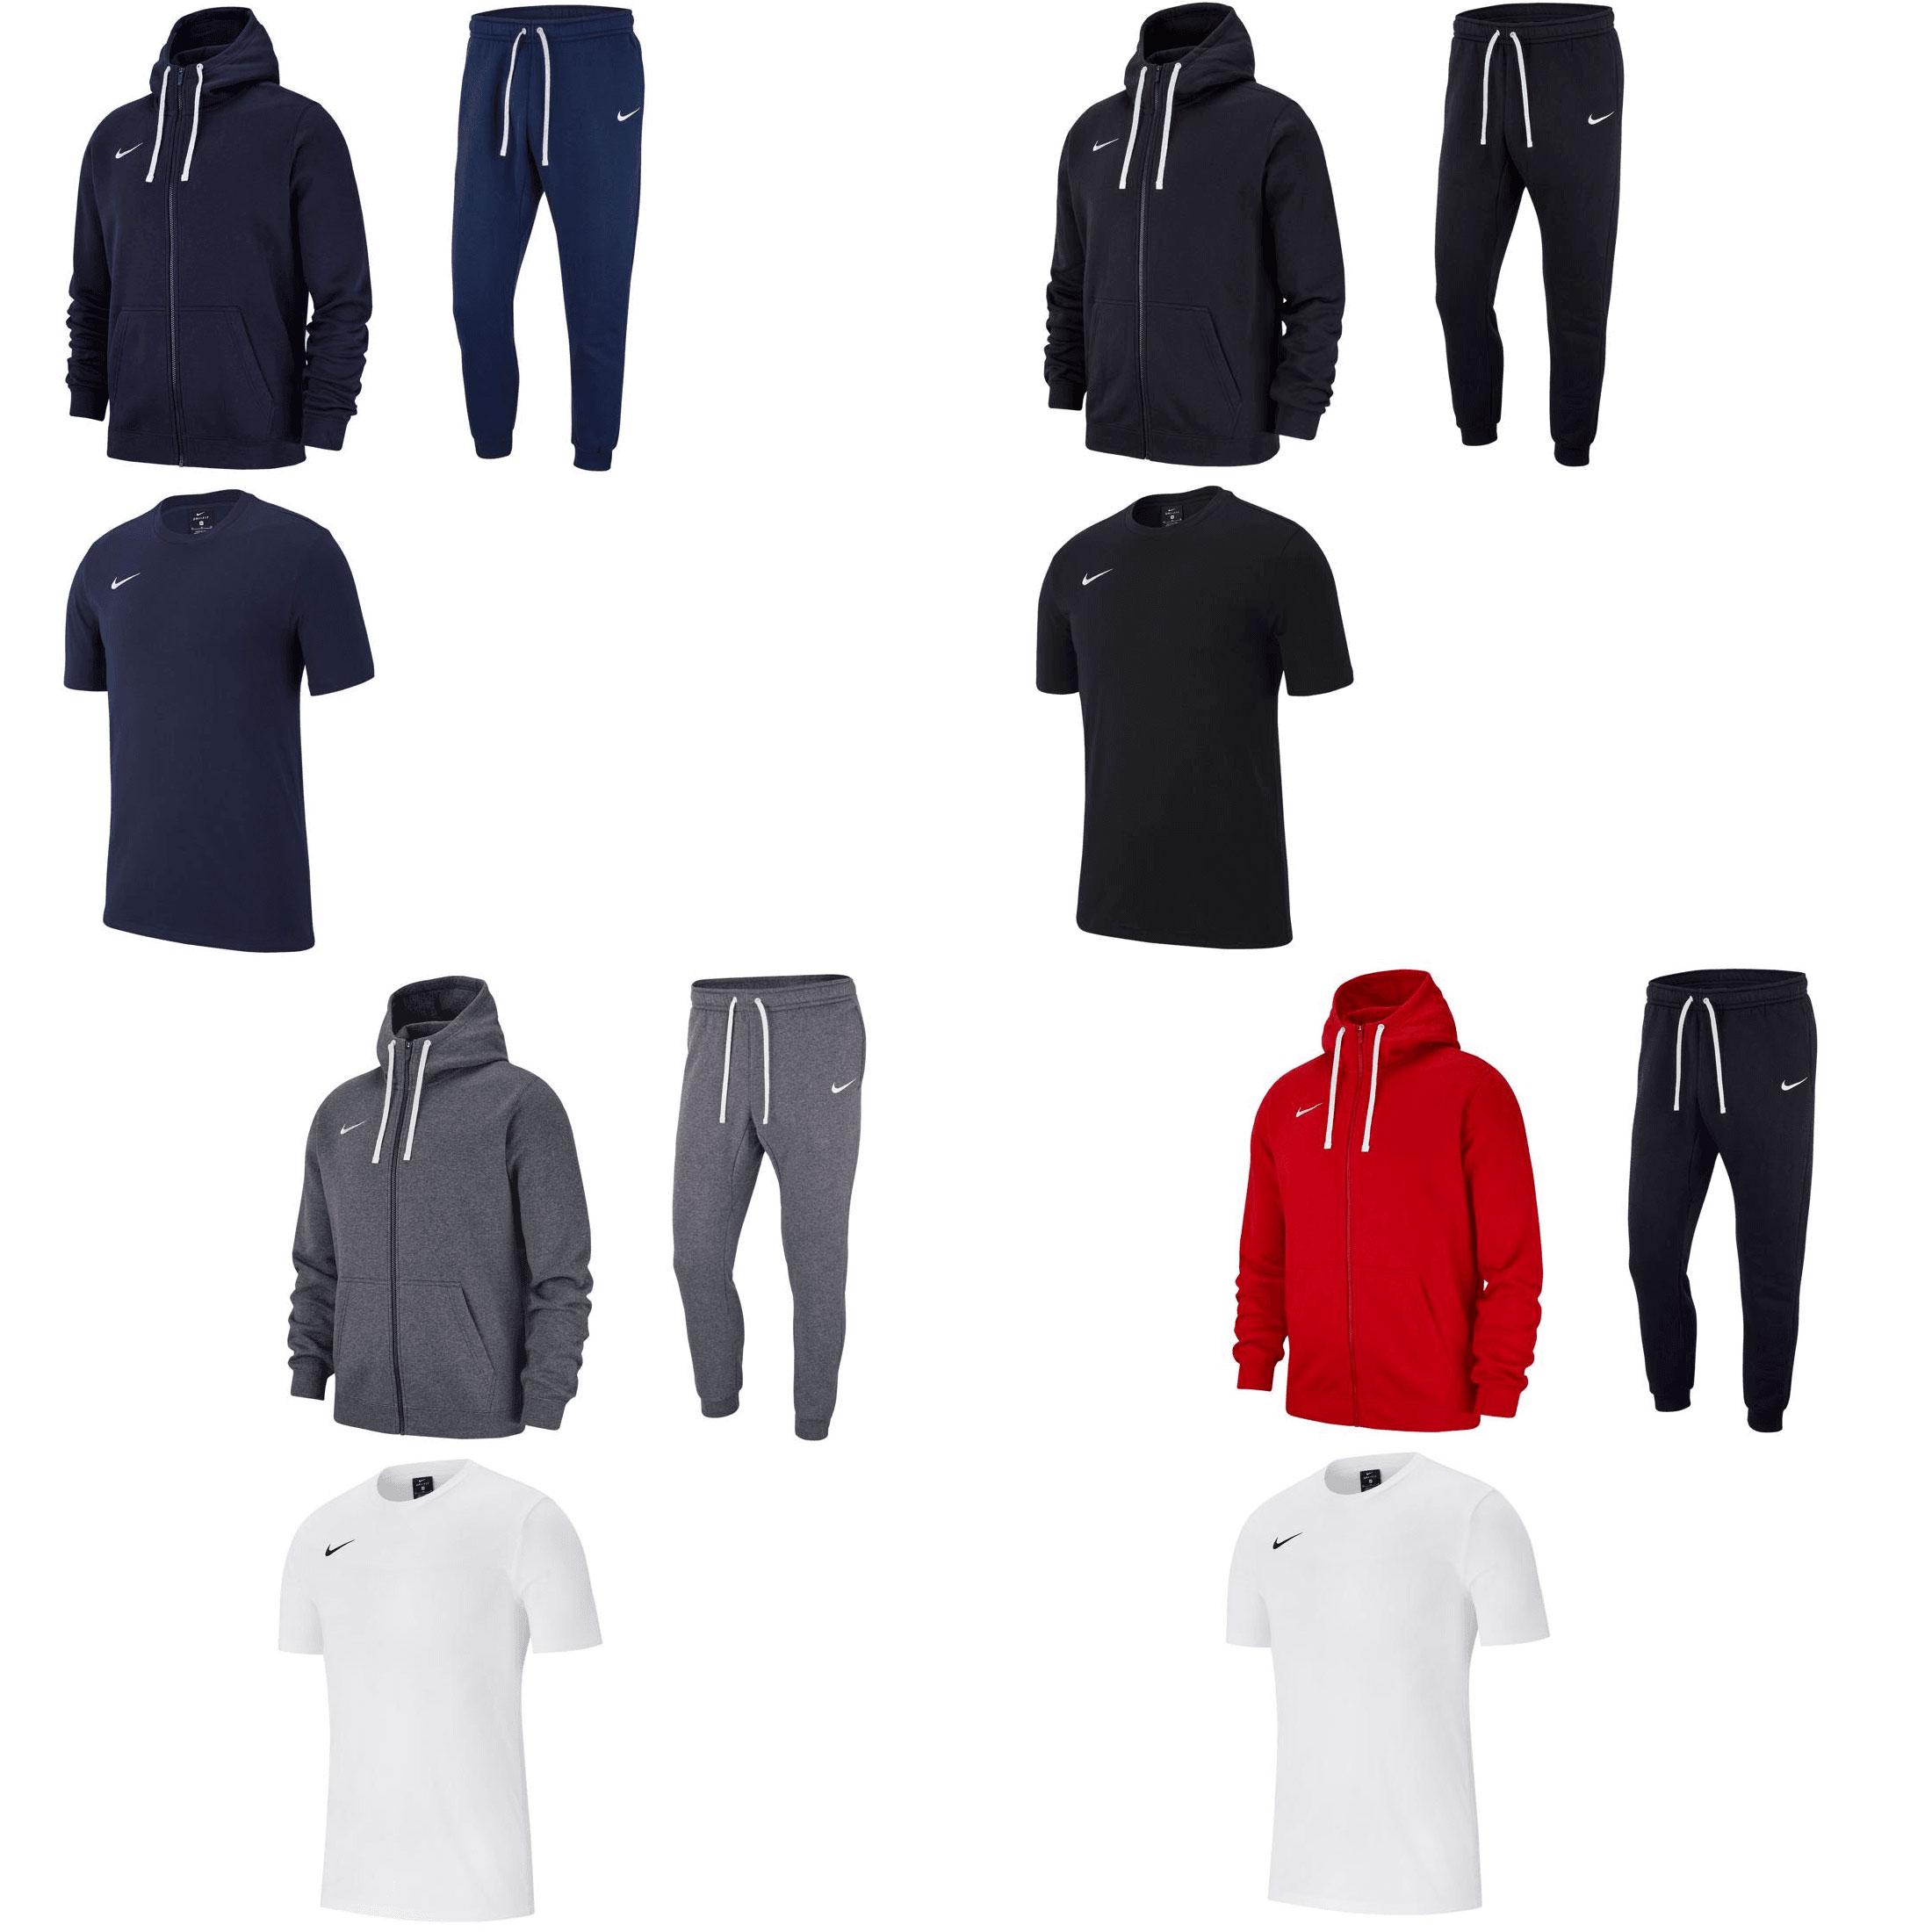 Nike driedelige set Team Club 19 -50% + gratis verzending t.w.v. €9,95 @ Geomix